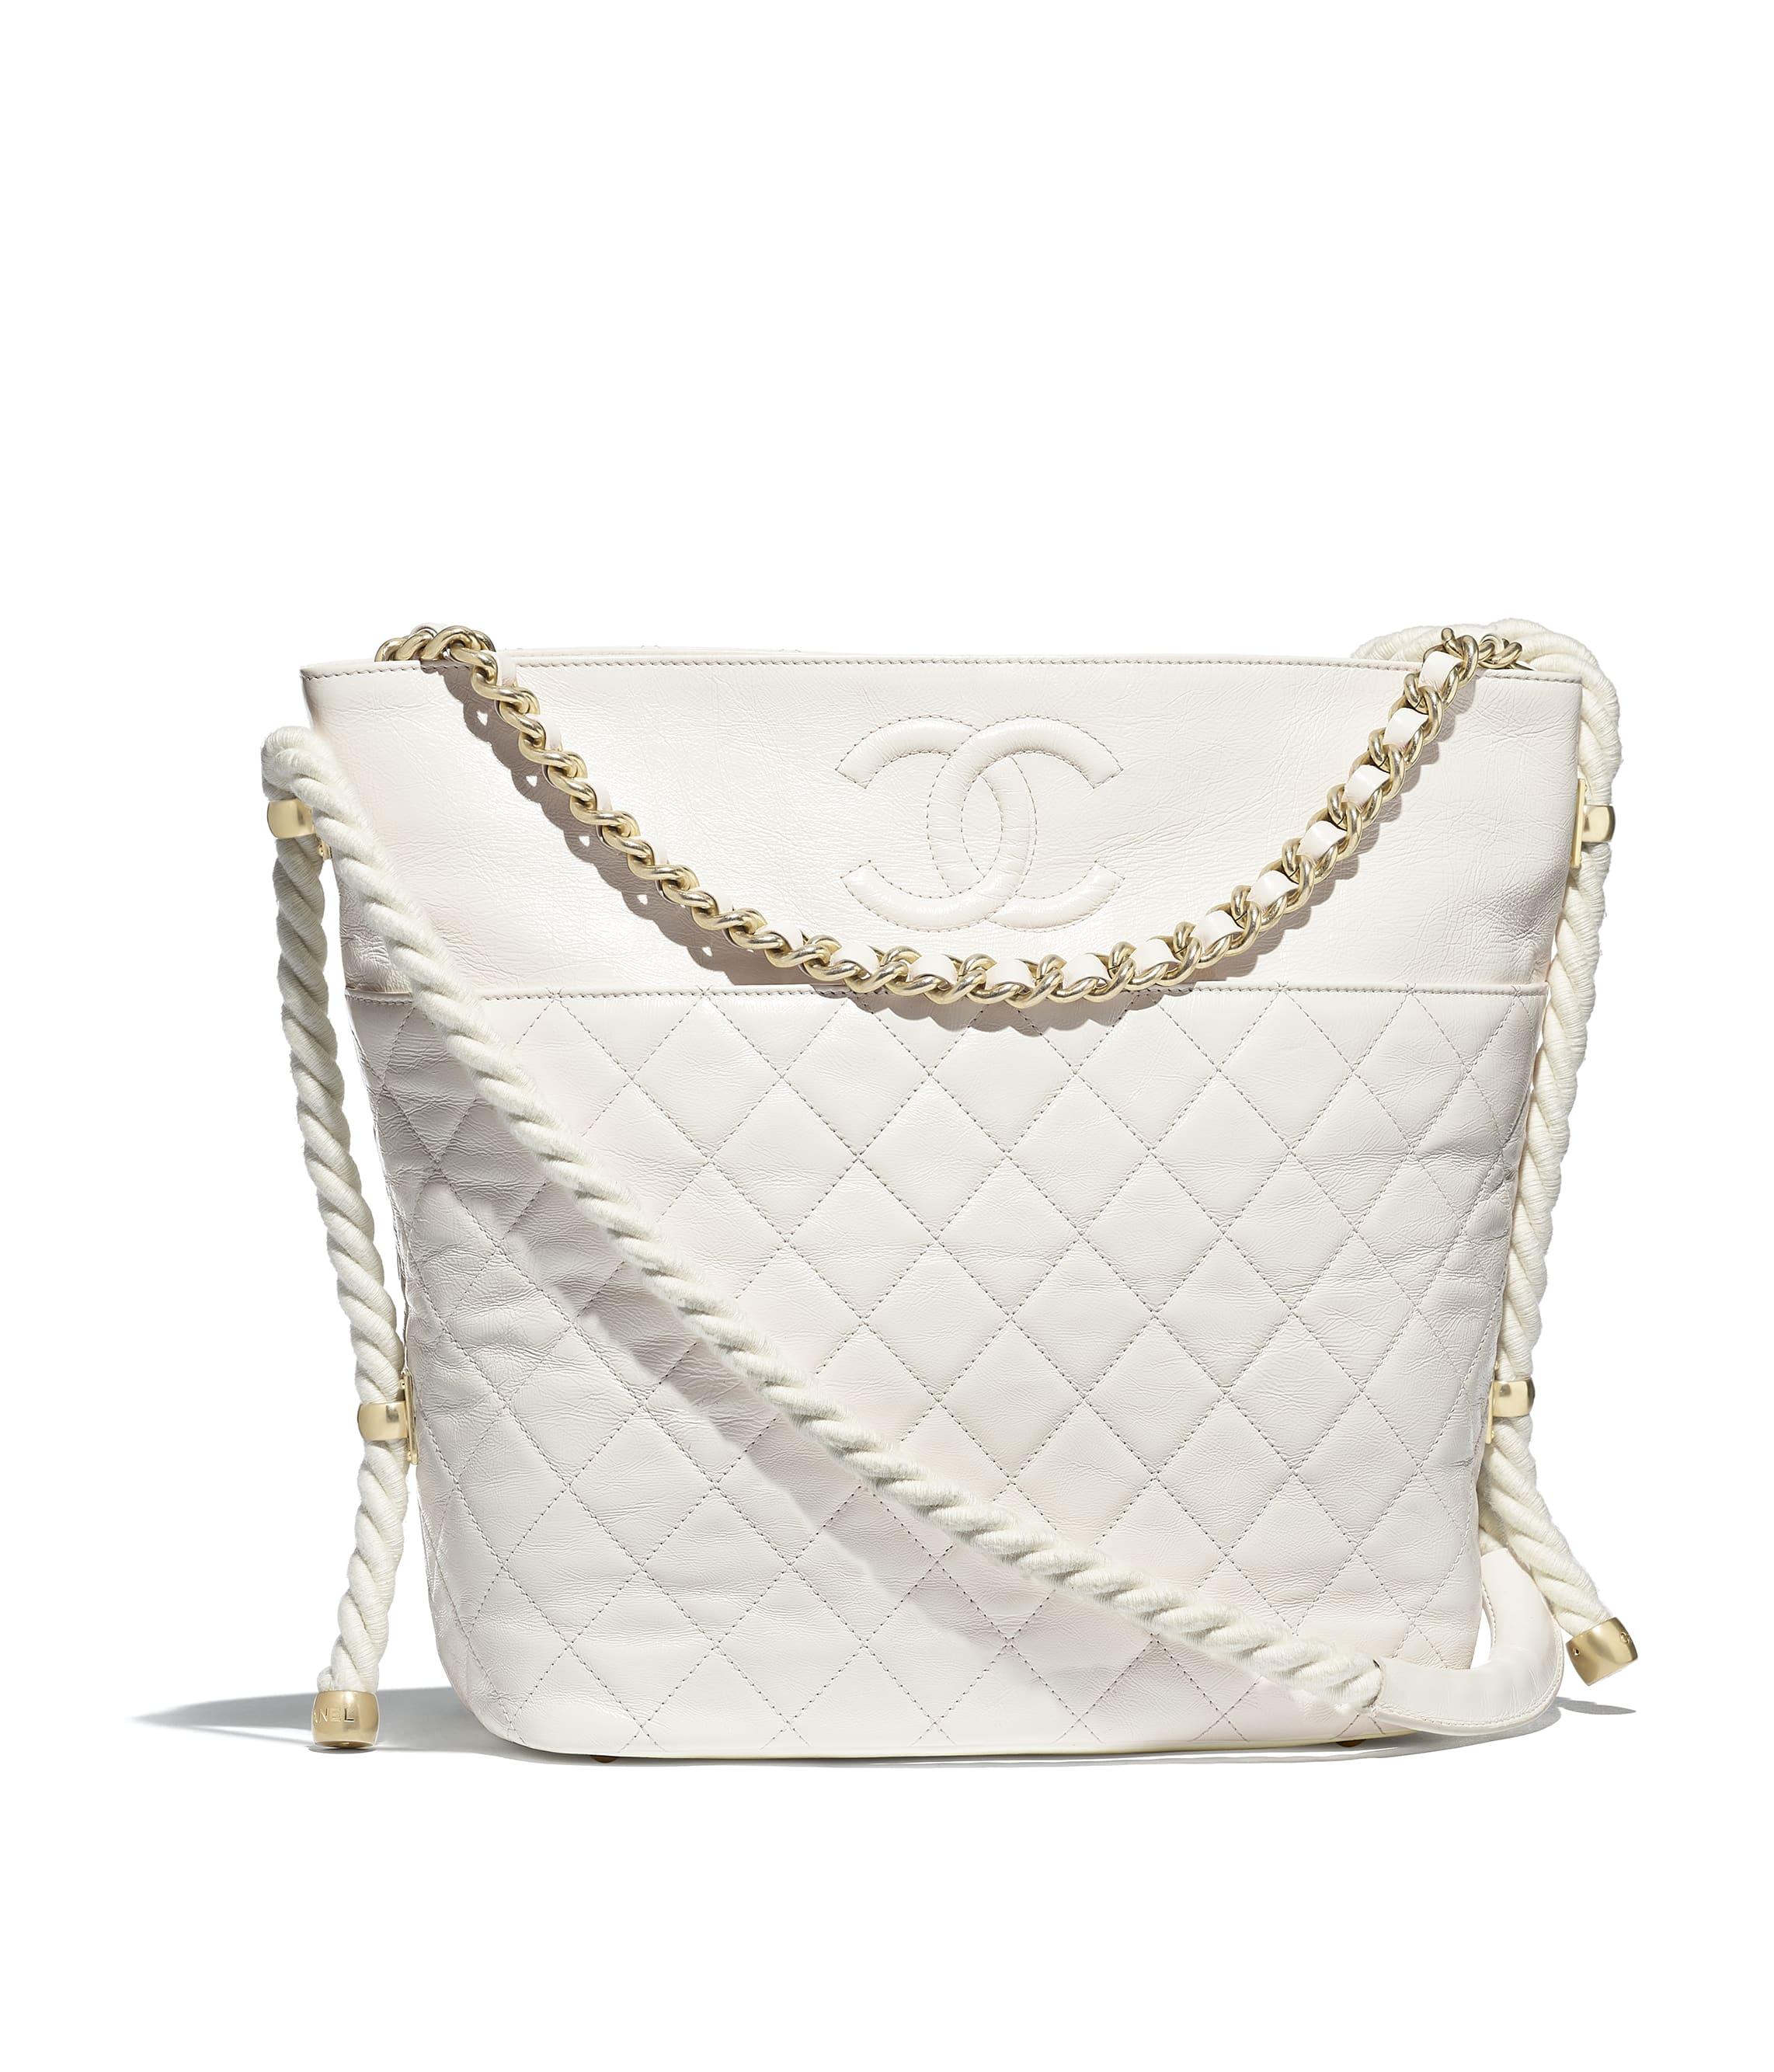 efd8c72a7ce8 Hobo Handbag, crumpled calfskin, cotton & gold-tone metal, white ...